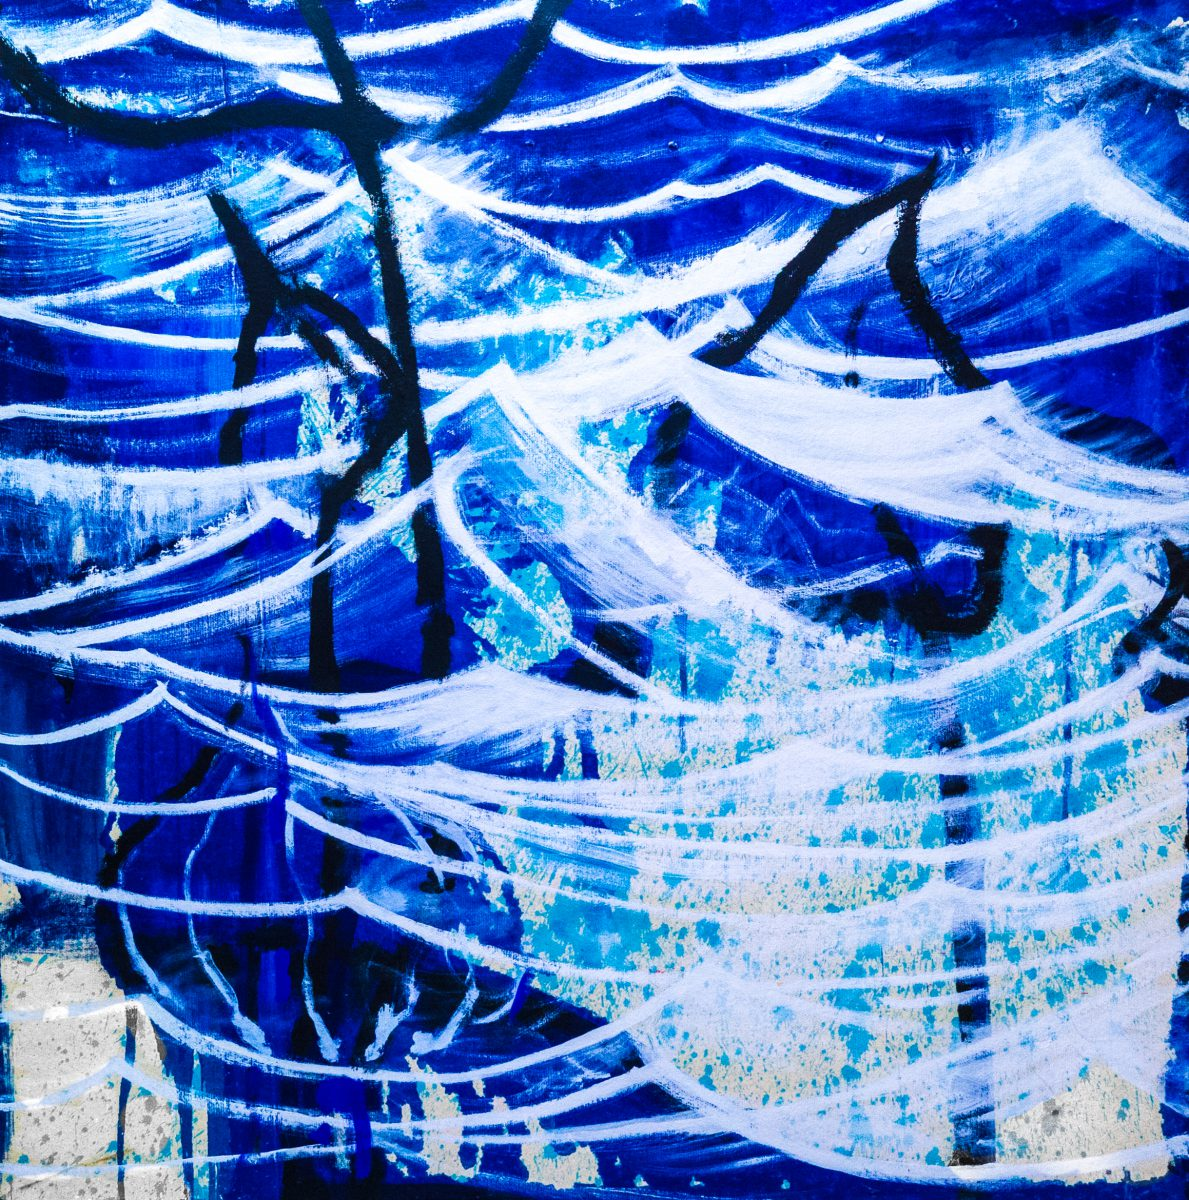 031_Underworld, Acryl auf Zellstoff, 182 x 182 cm